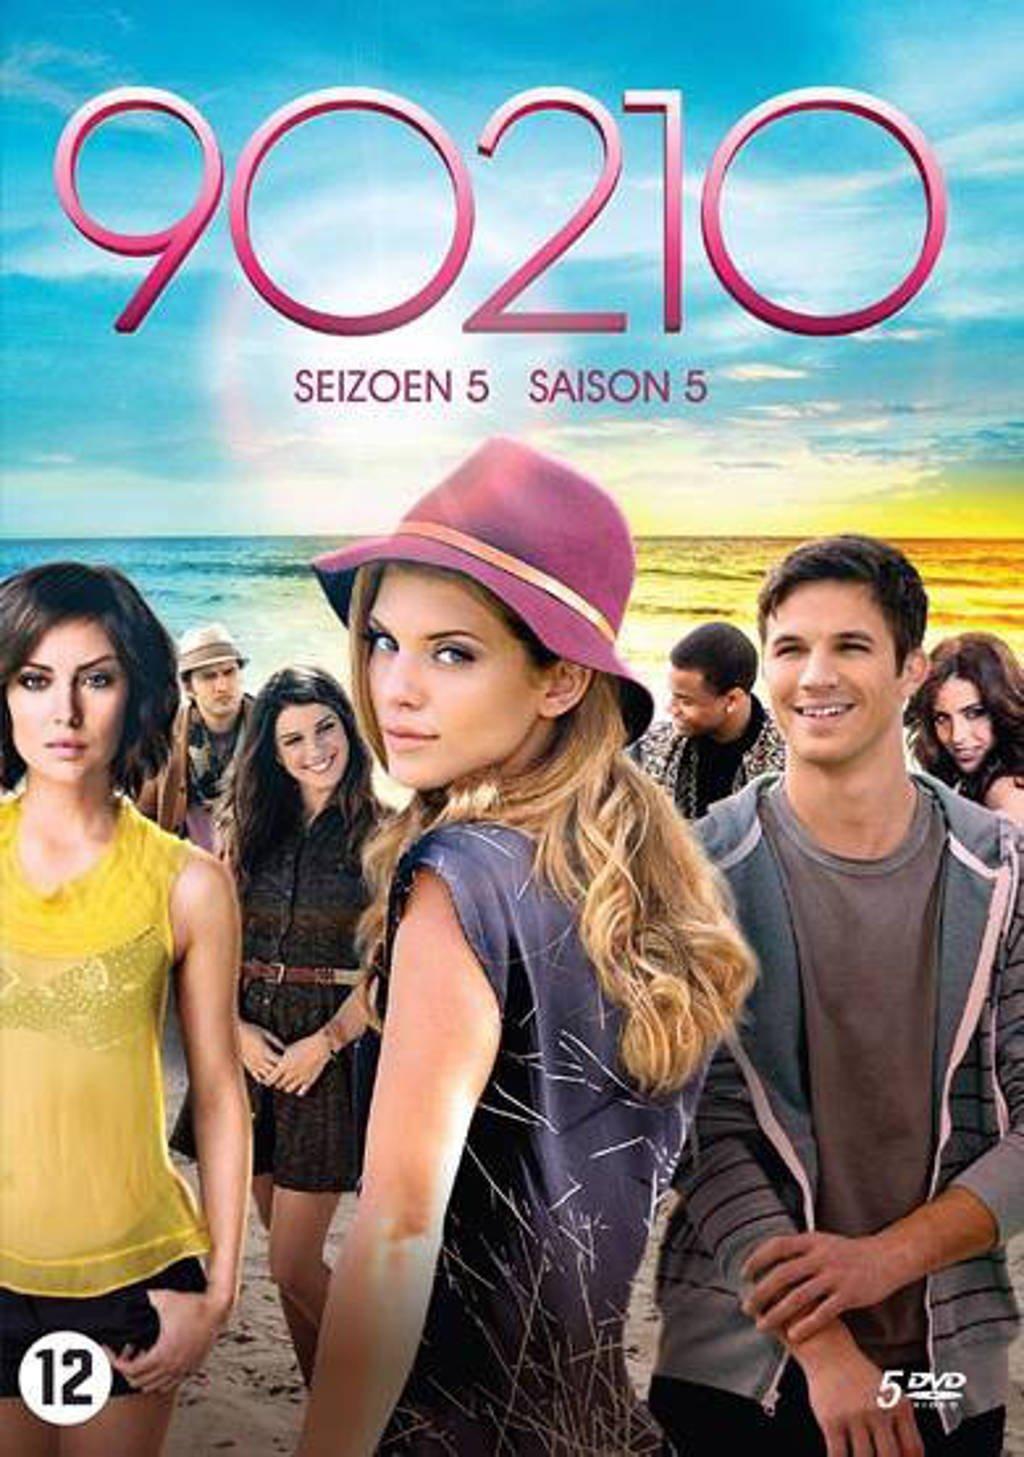 90210 - Seizoen 5 (DVD)